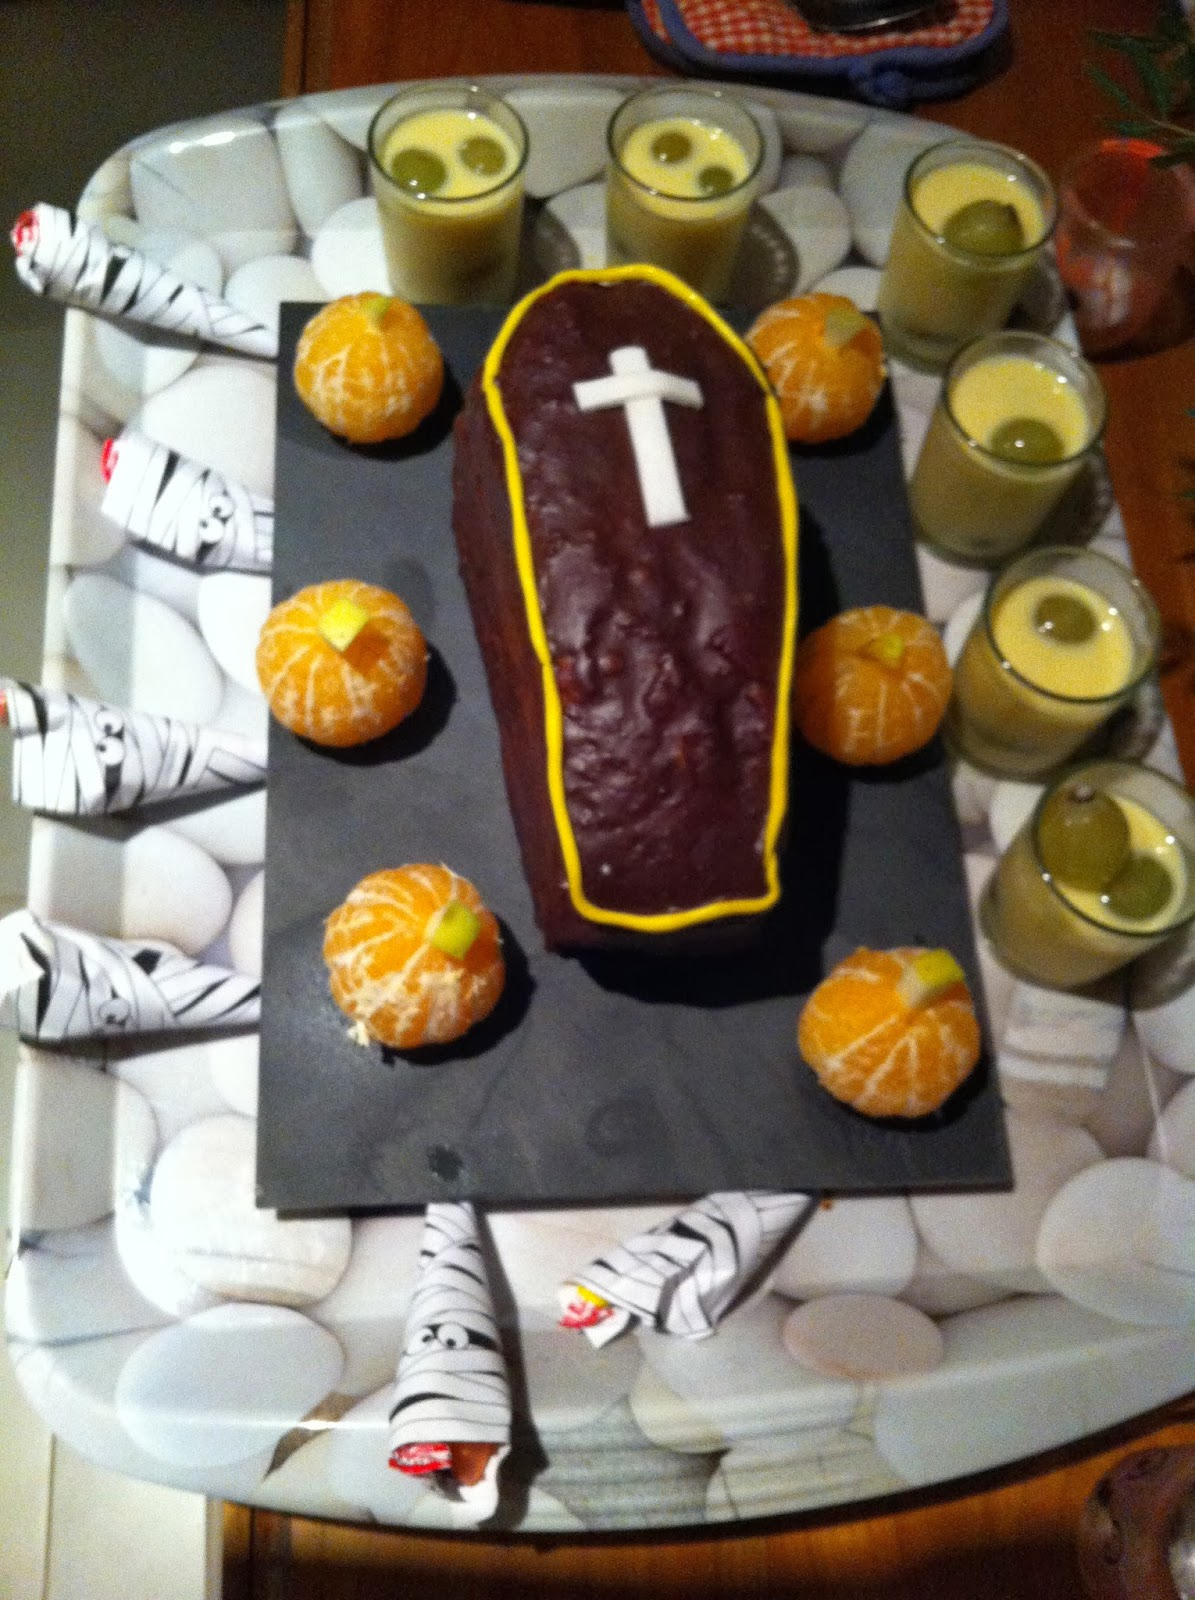 Les douceurs de lisou id e de menu d 39 halloween - Idee menu halloween ...